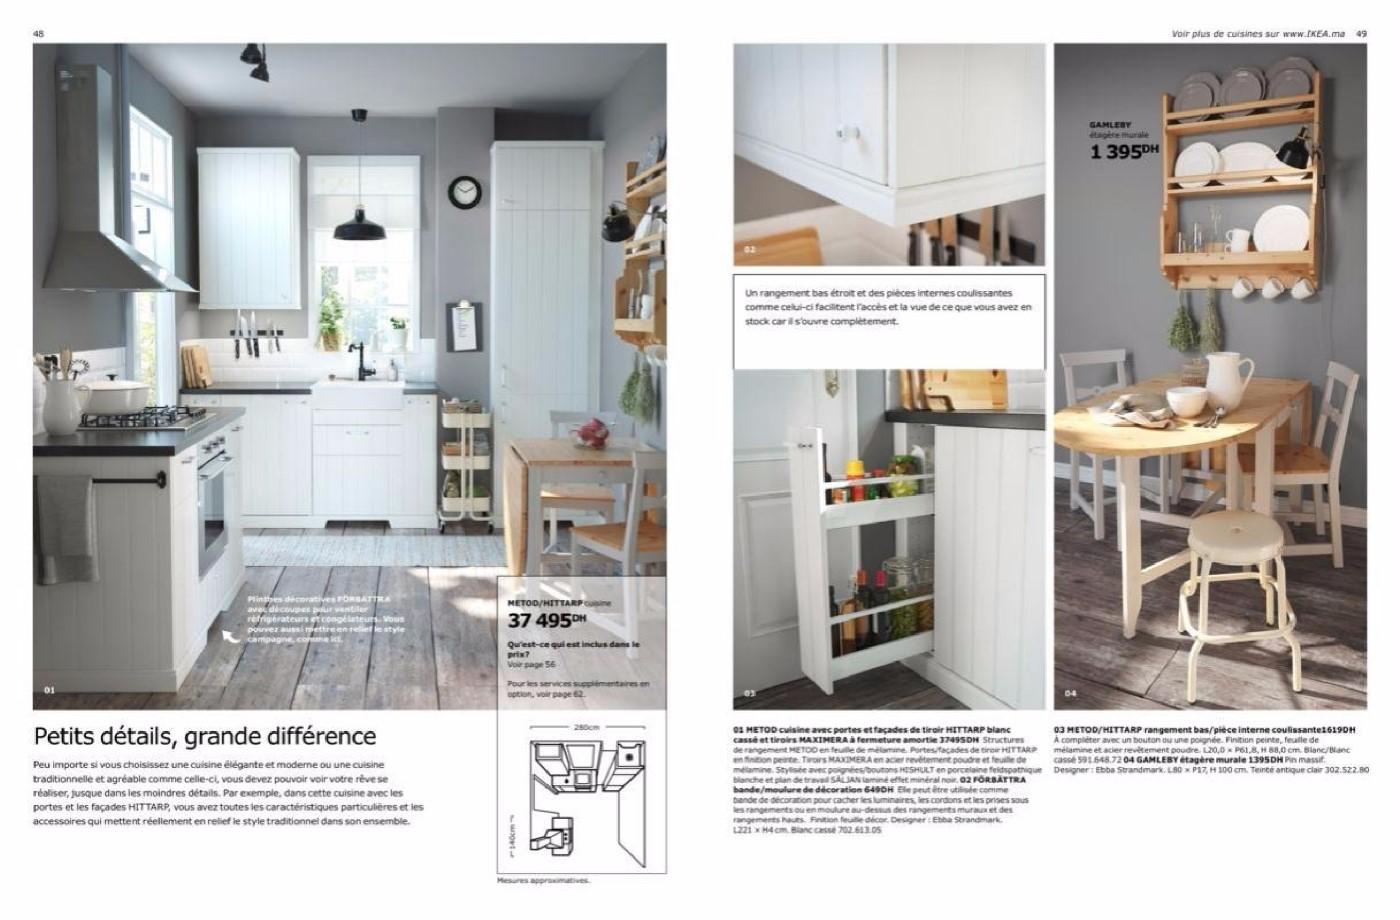 Cuisine 2017 Ikea   Cuisines Ikea Soldes Catalogue Ikea Maroc Cuisine 2017 Les Soldes Et